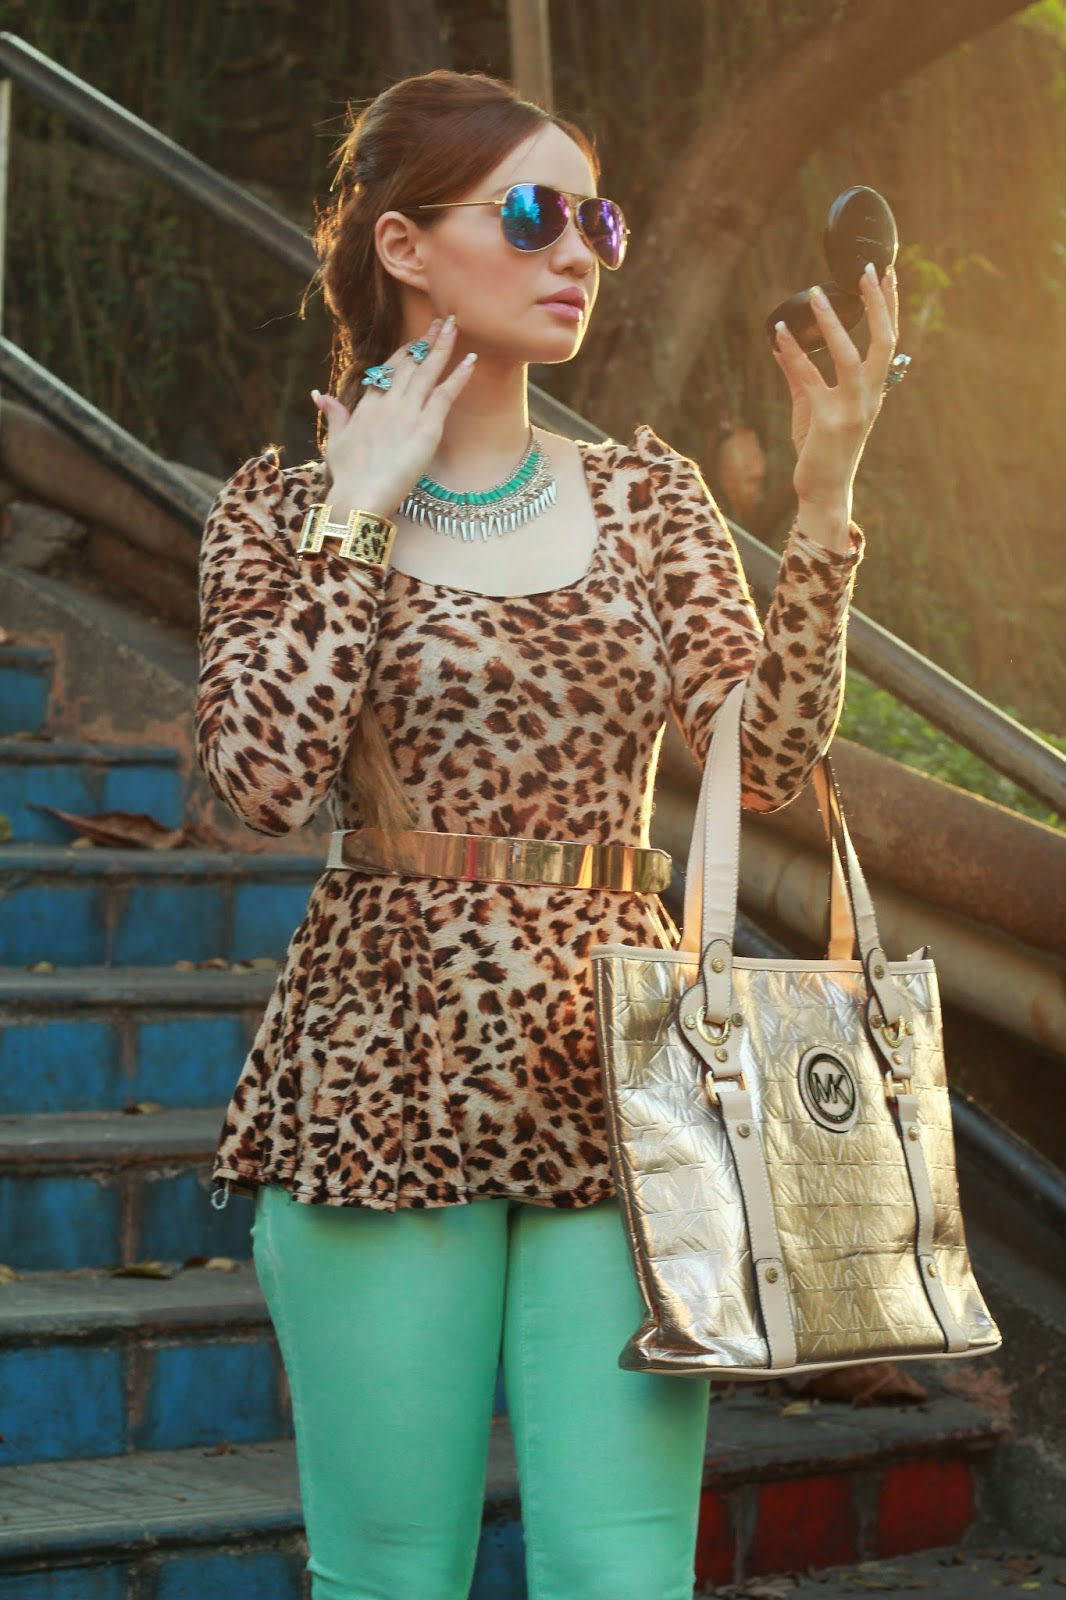 Leopard Print Peplum Top & Mint Green Jeans 1